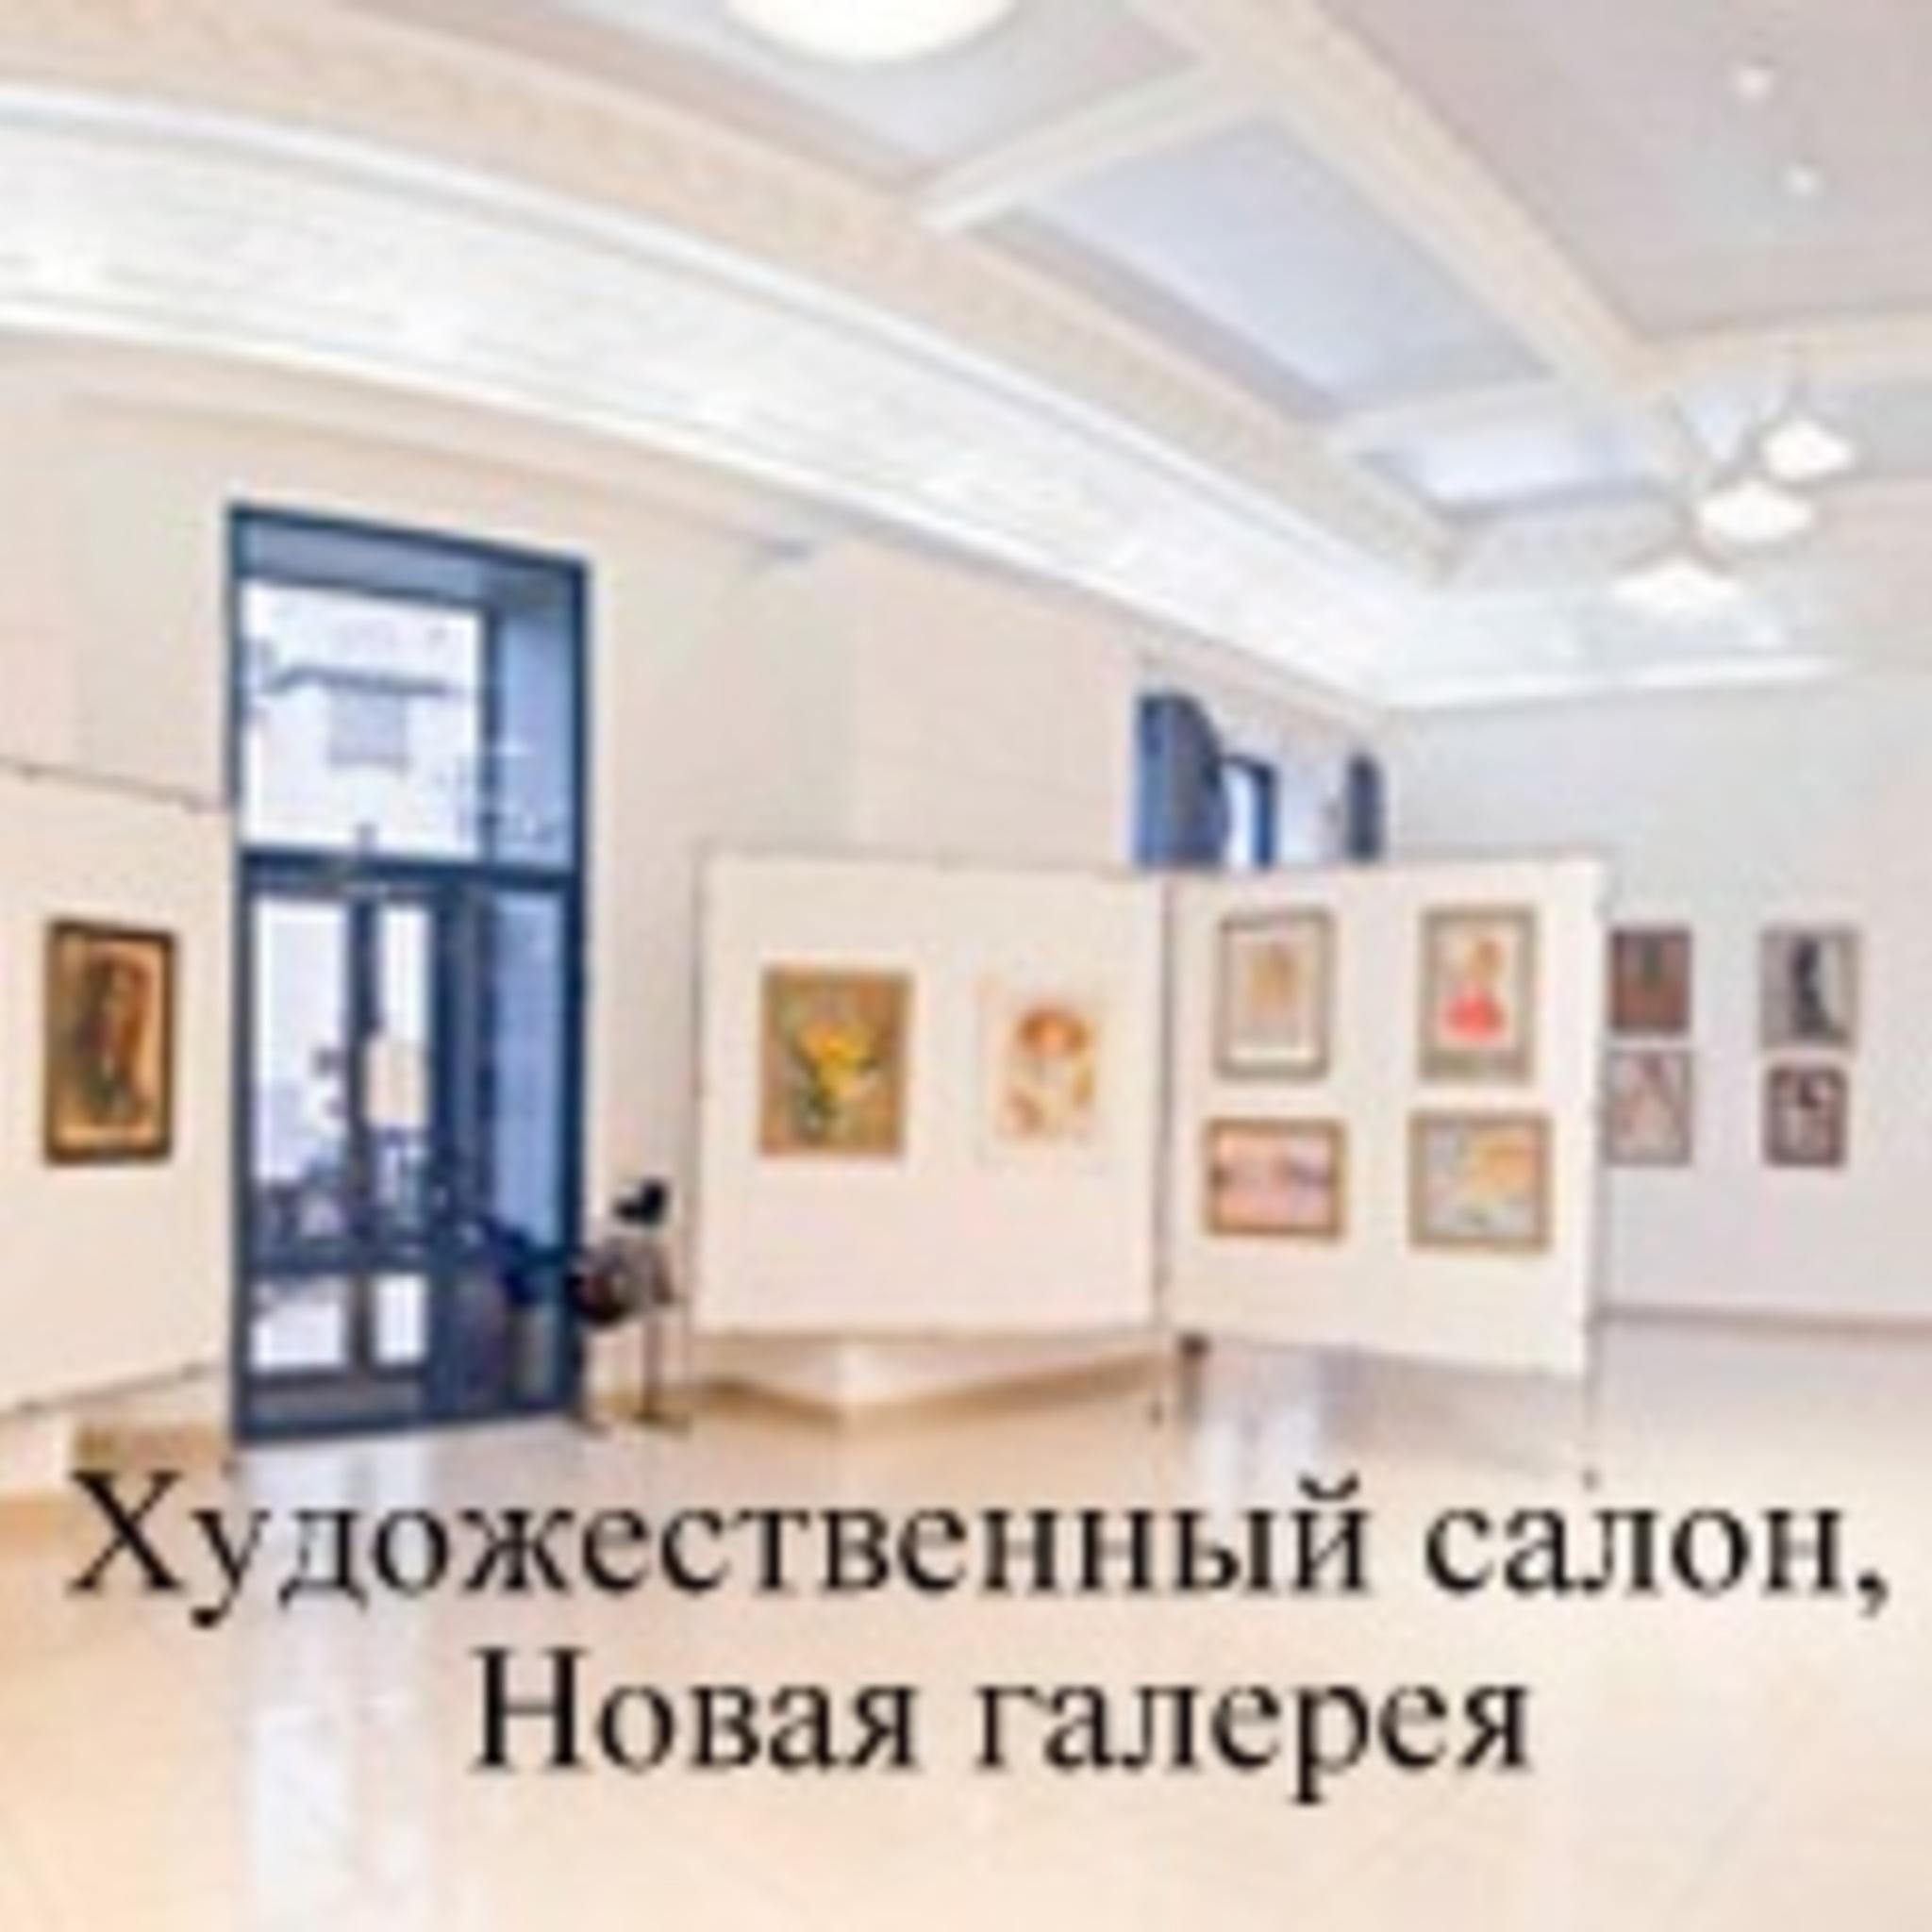 Art salon, a New gallery